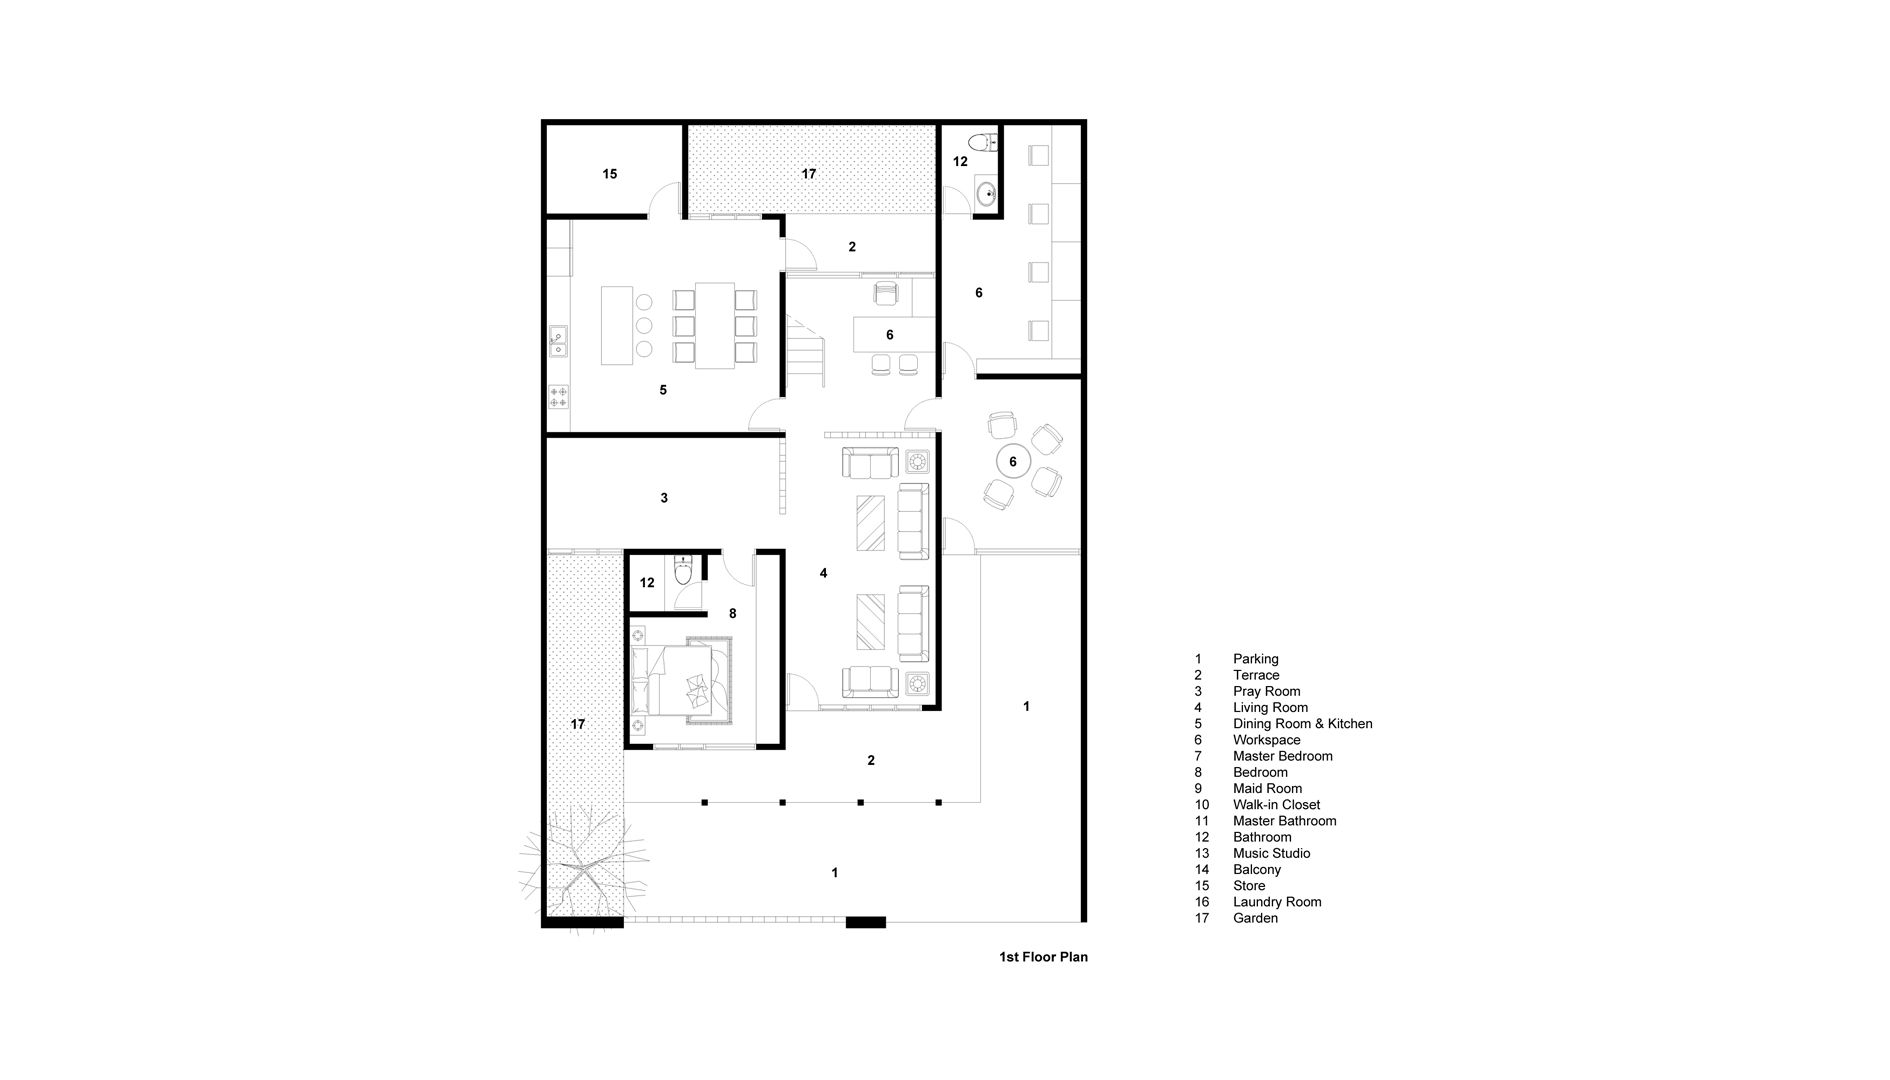 2015-BATUNUNGGAL-HOUSE-03